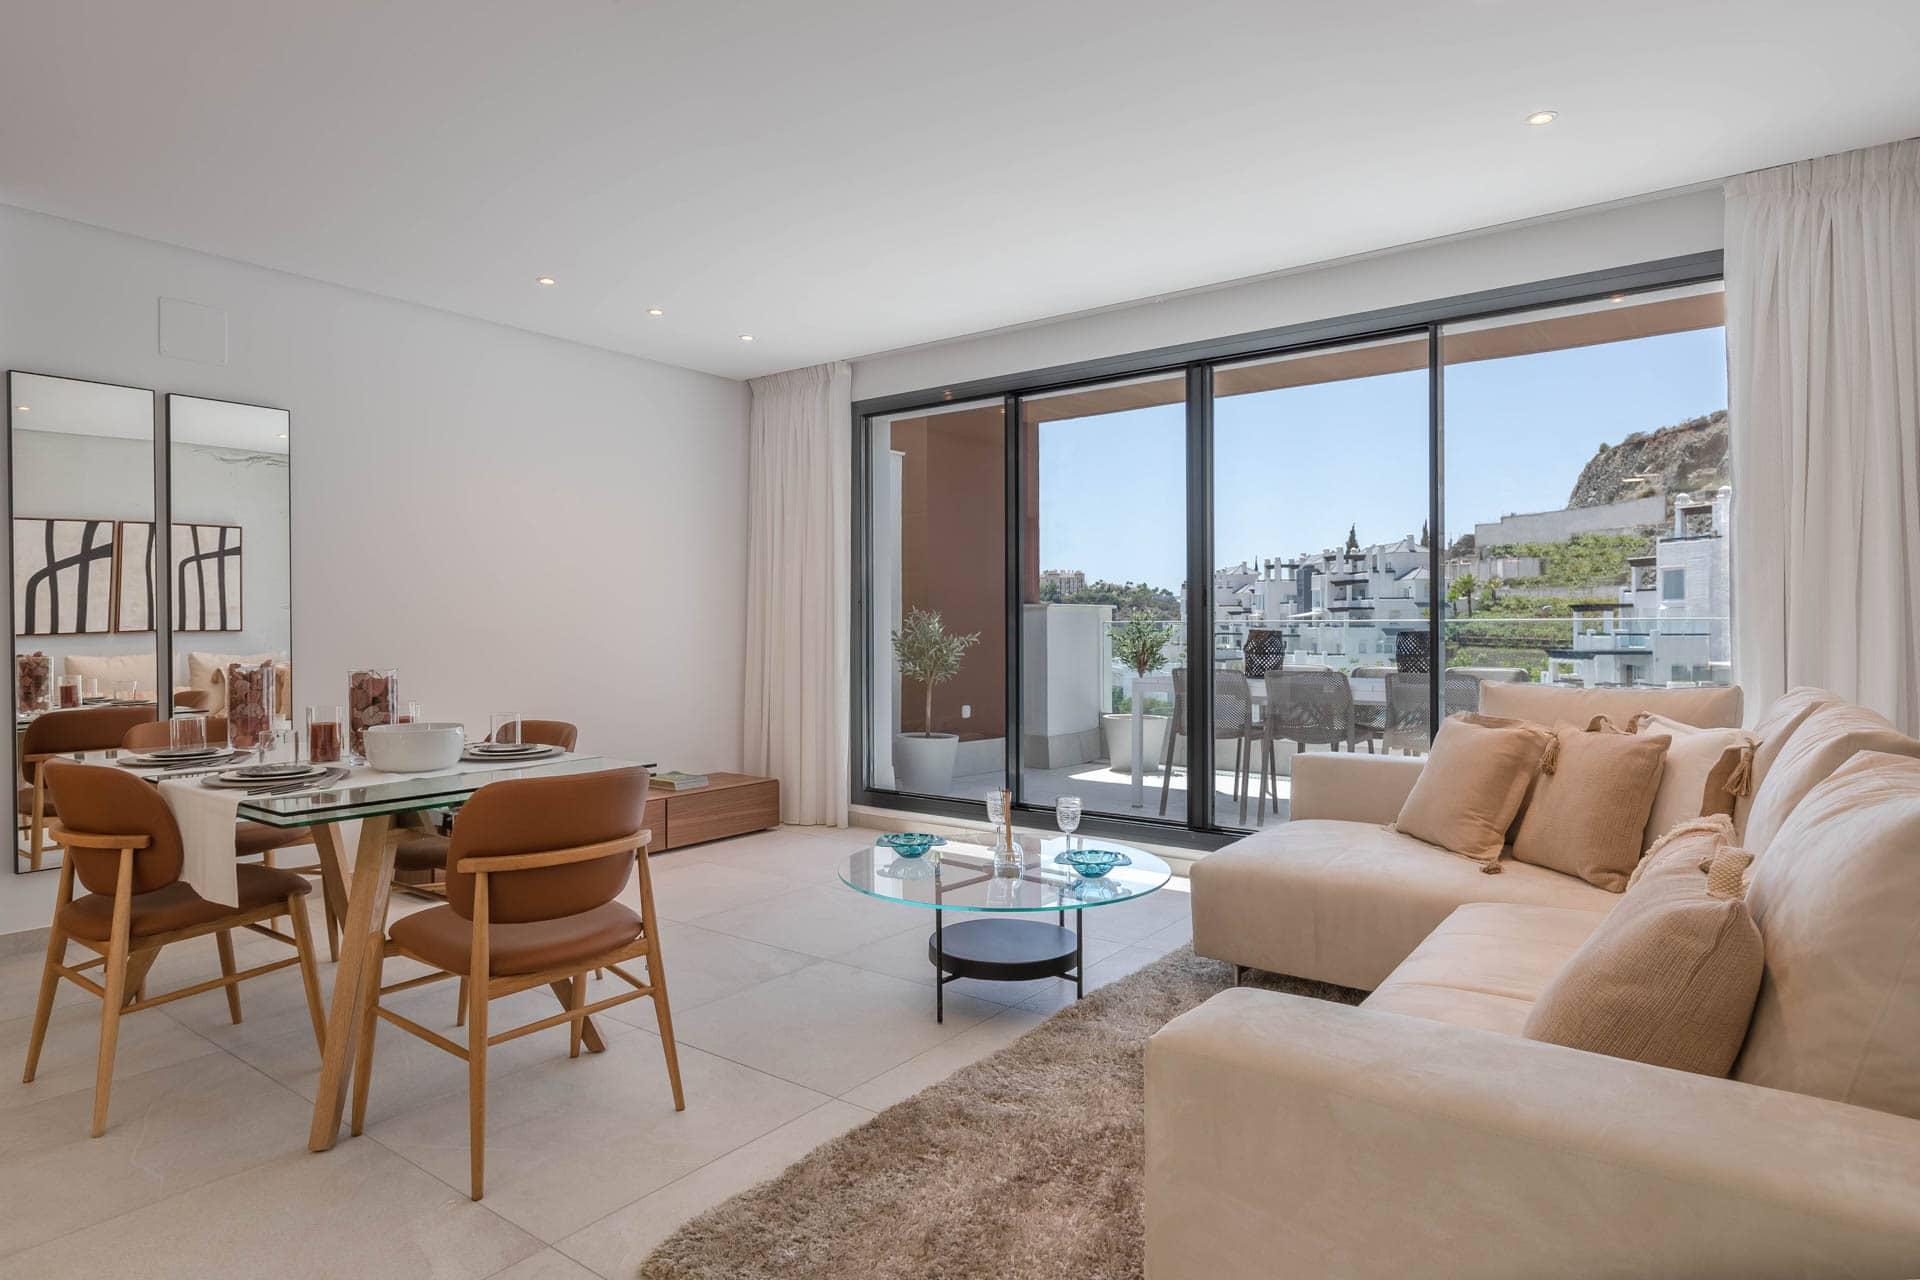 01 - Living room 1 - Alborada Homes - Full Res